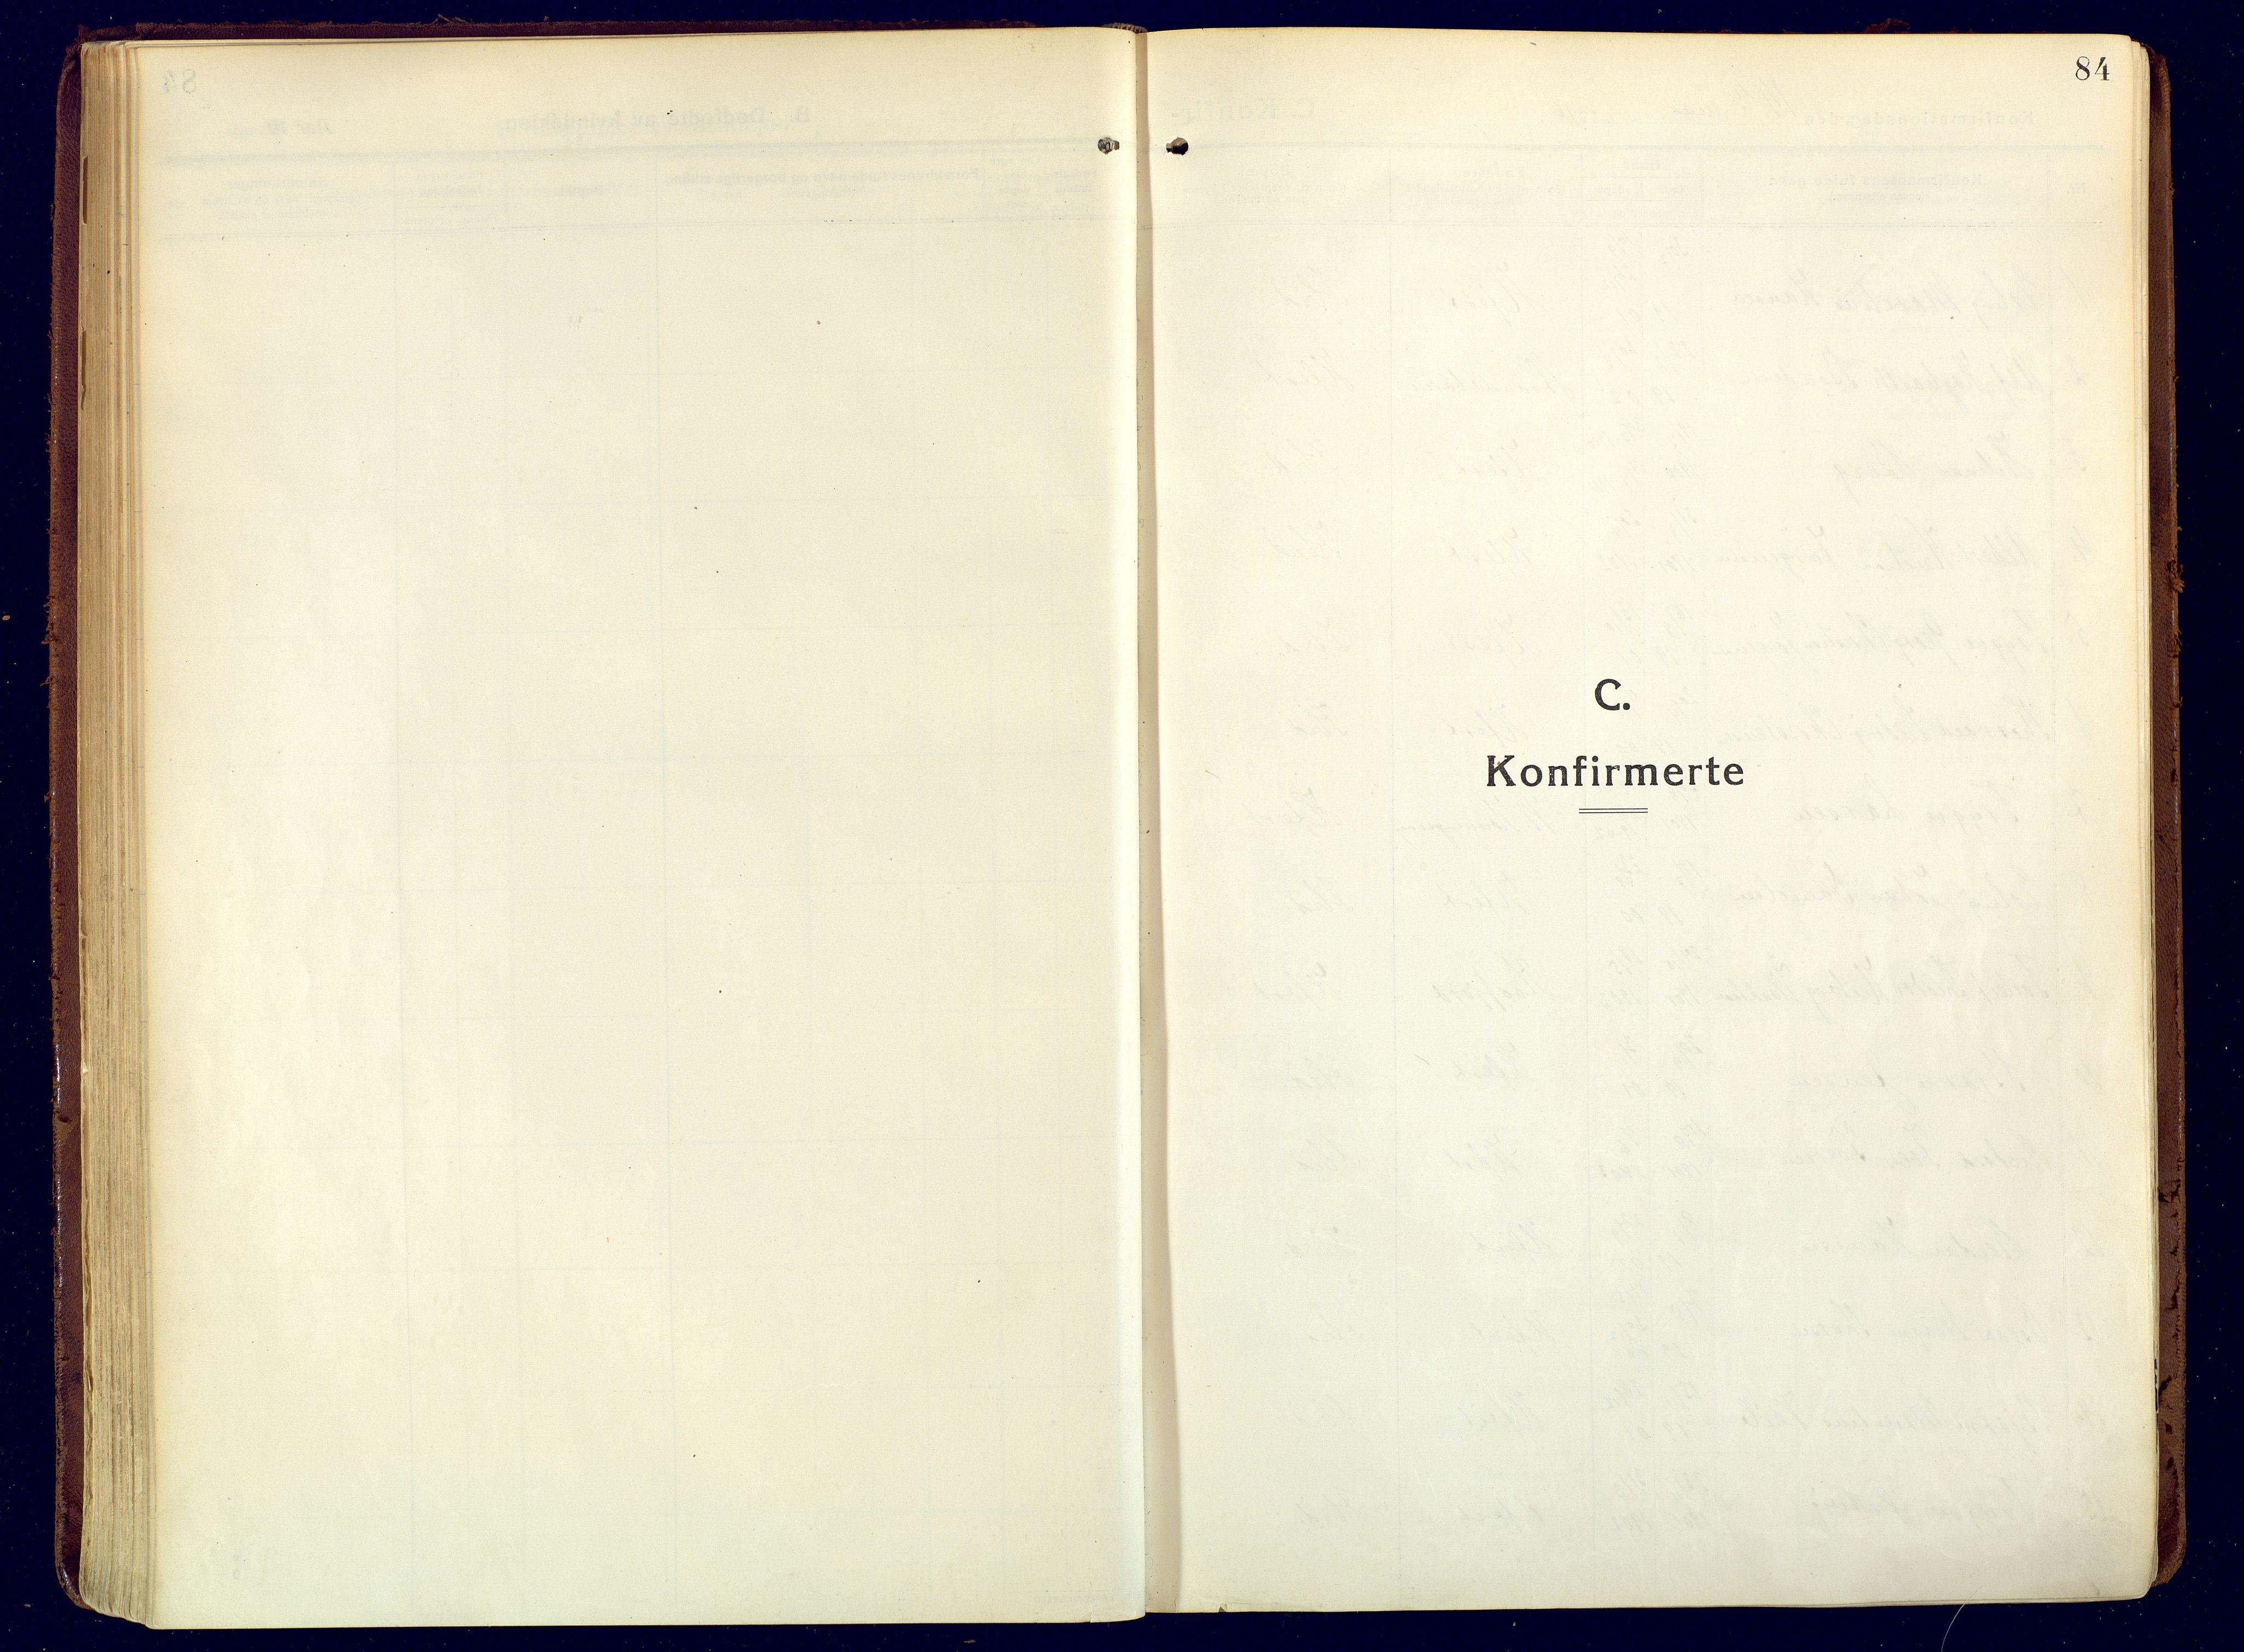 SATØ, Hammerfest sokneprestembete, Ministerialbok nr. 15, 1916-1923, s. 84